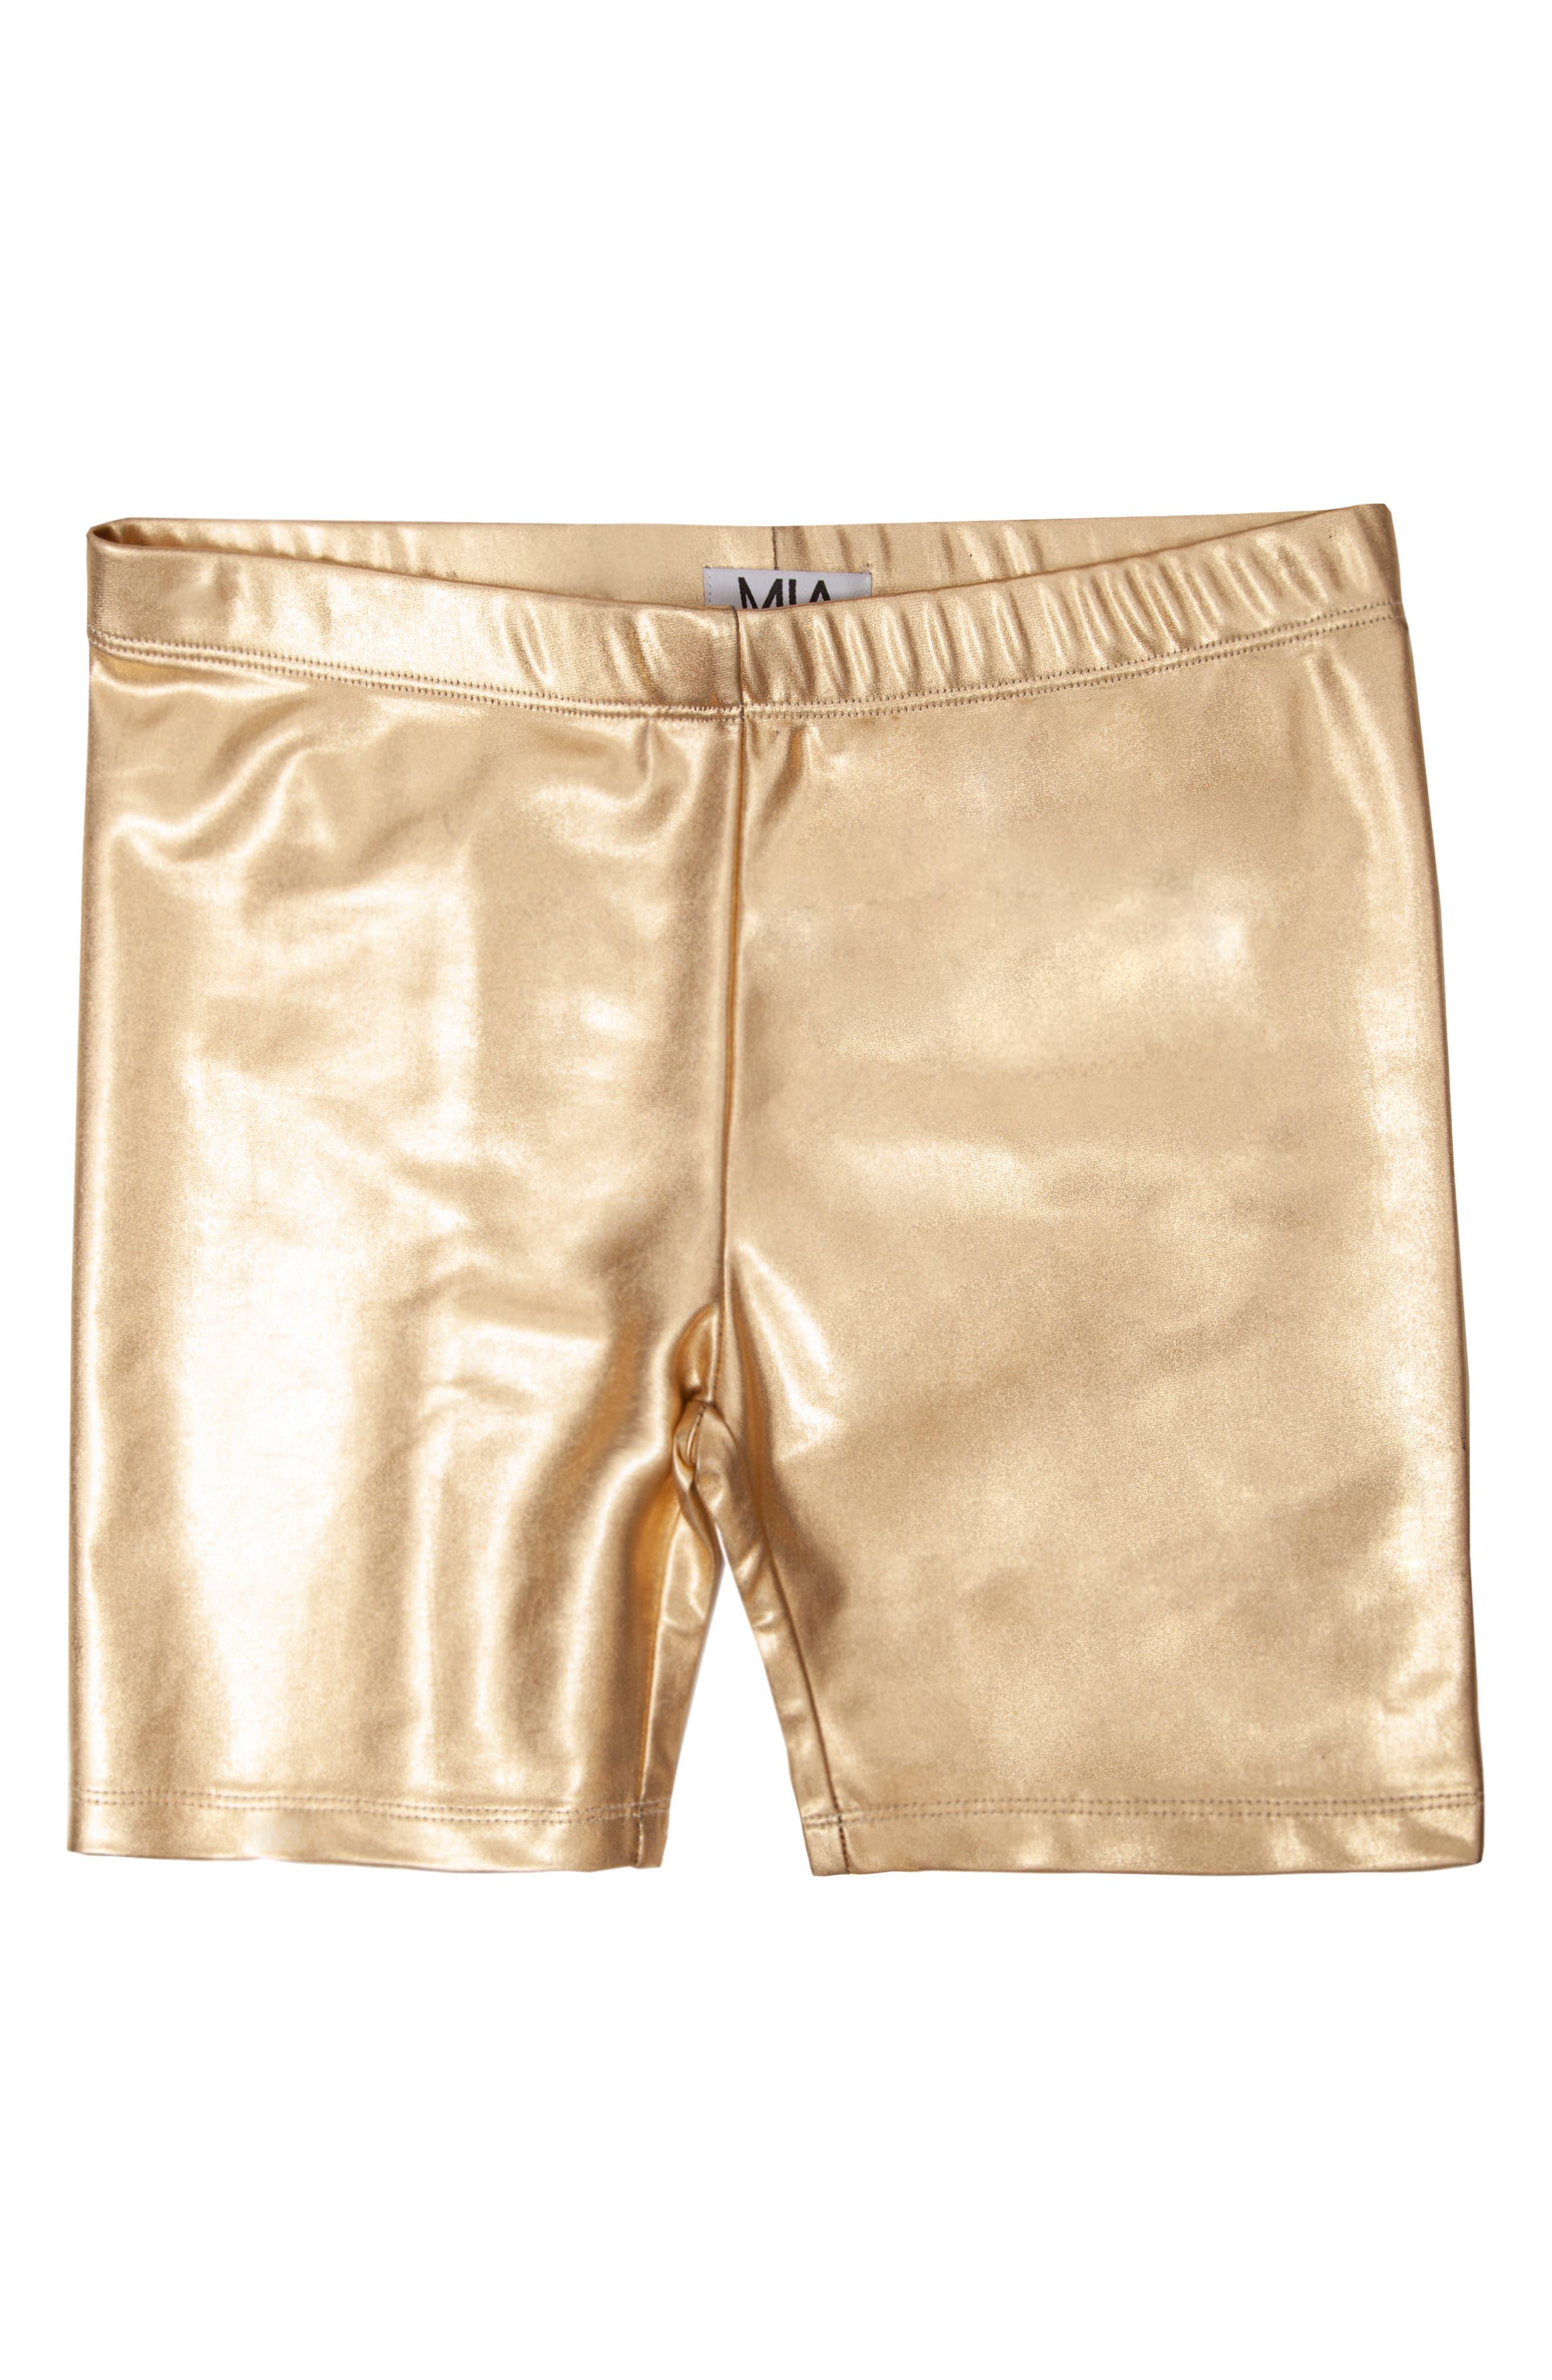 MIA New York Girl's Mia New York Bike Shorts, Size S - Metallic